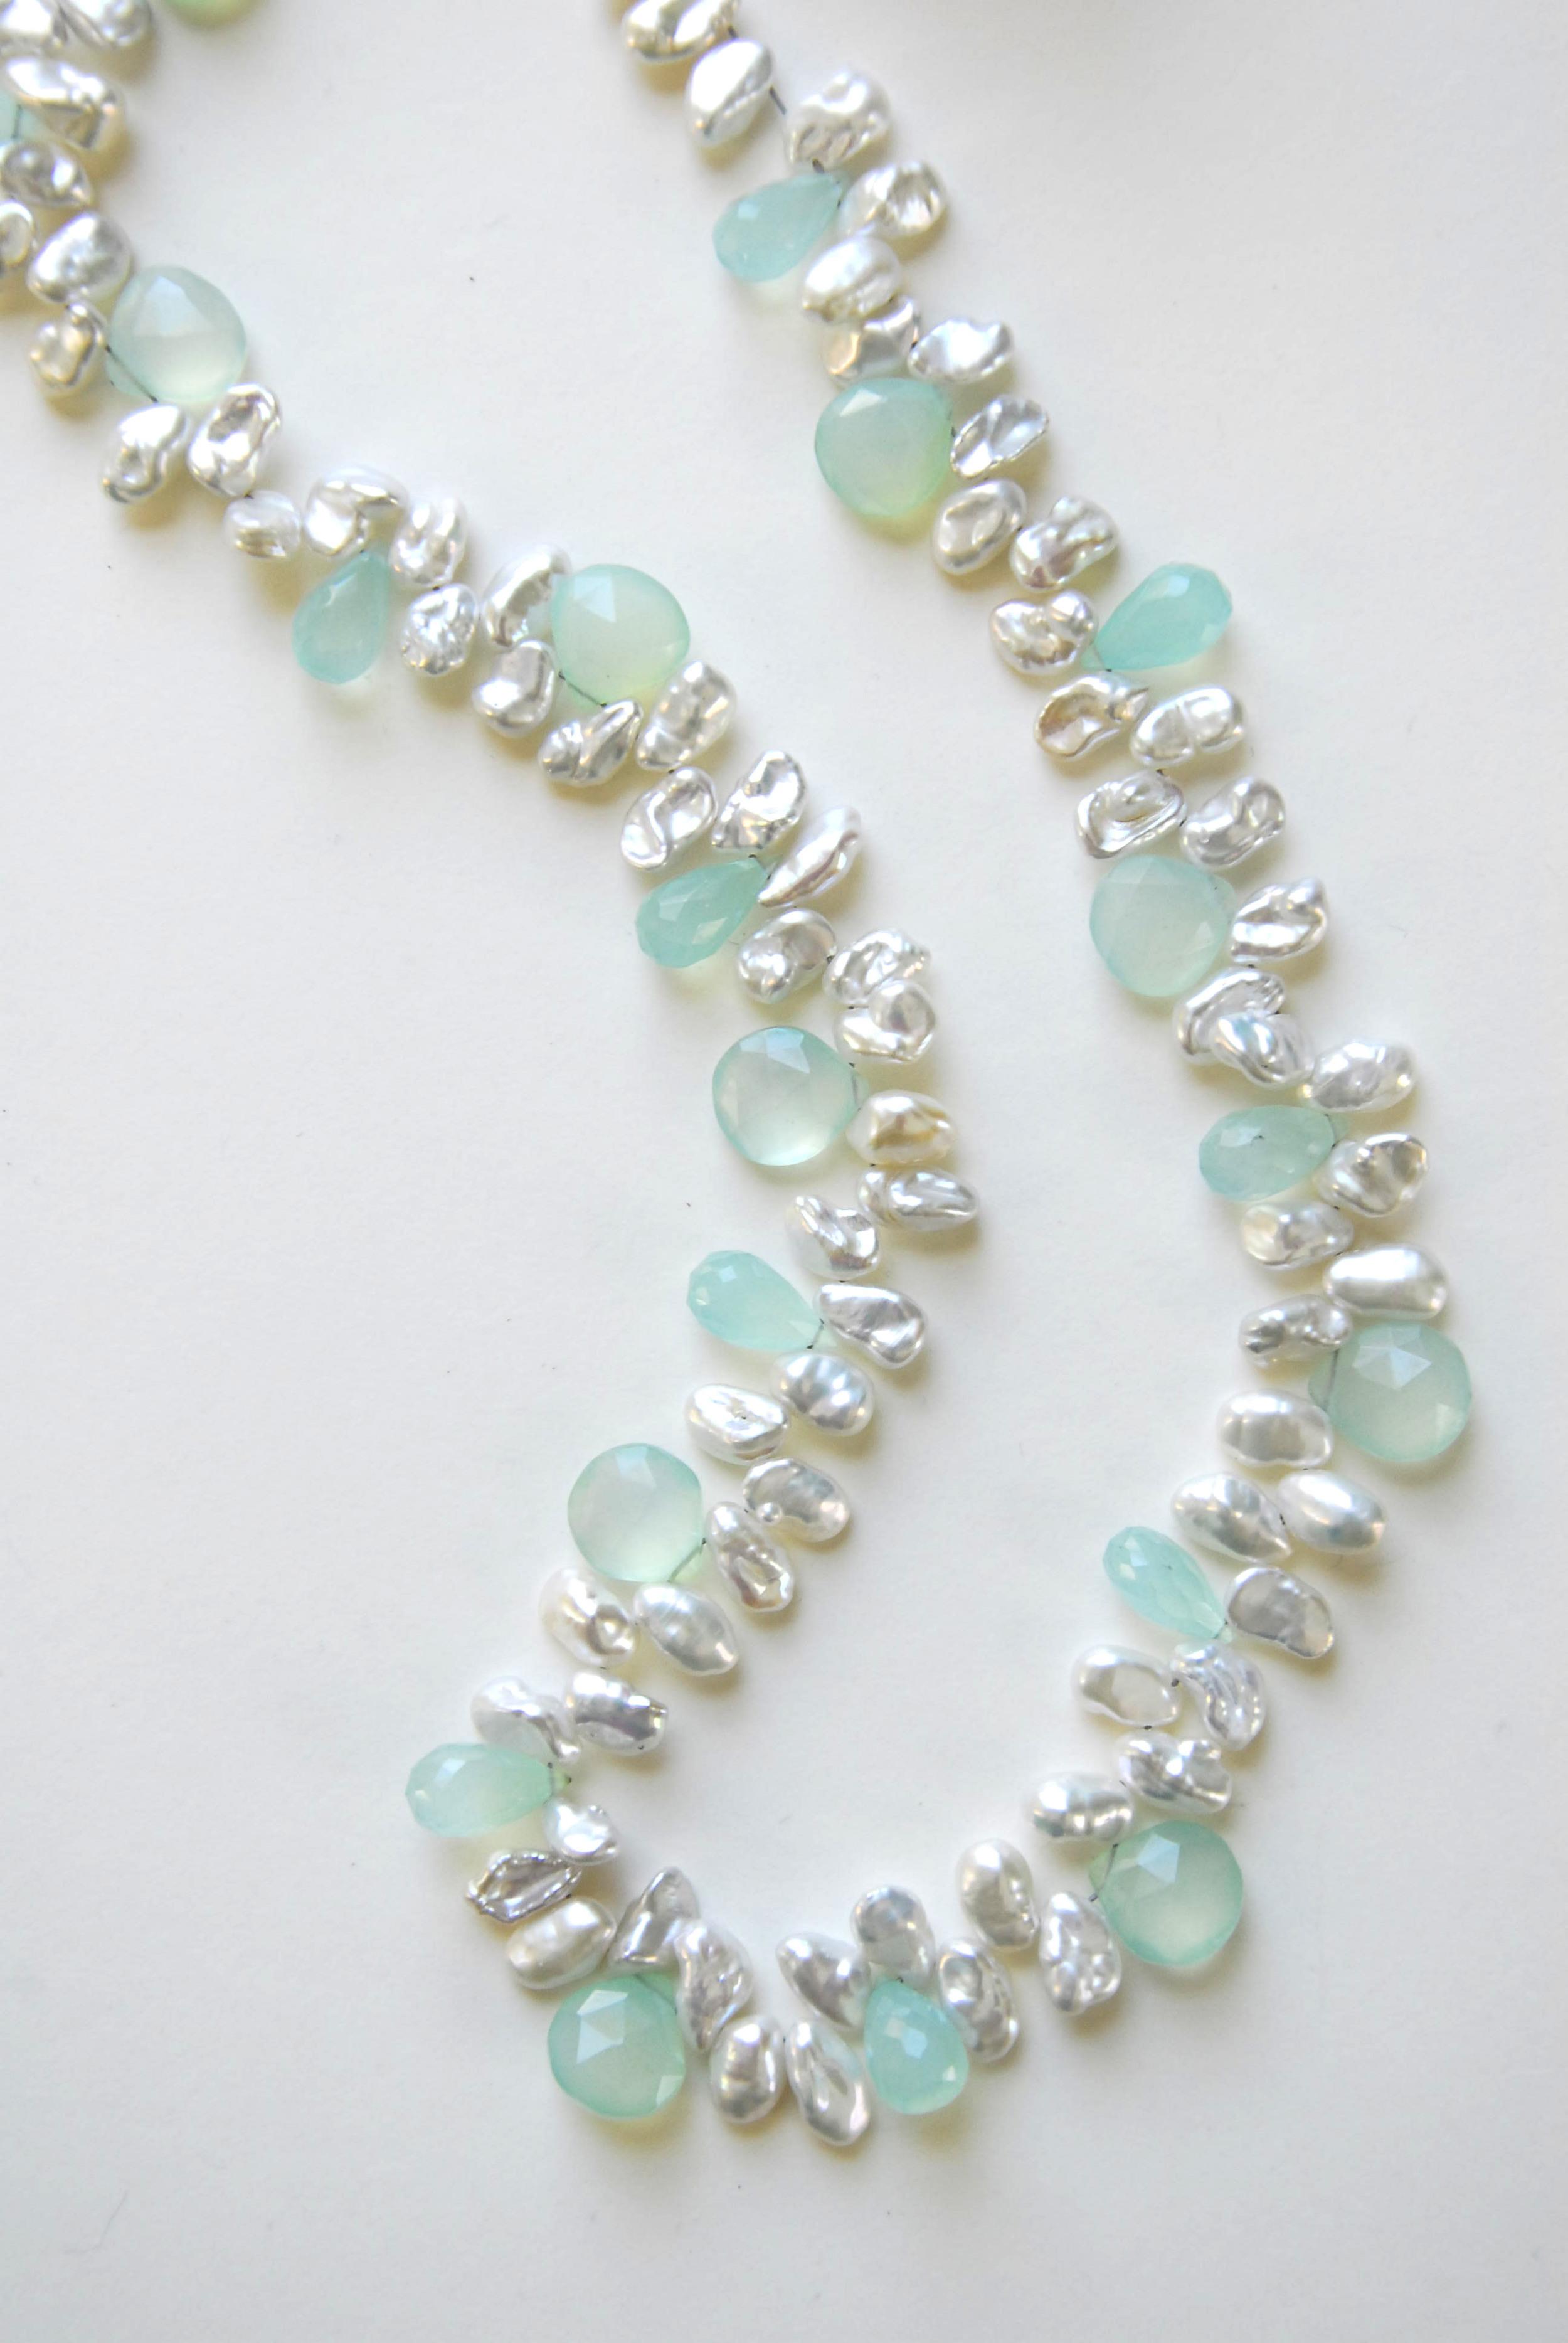 21814-new jewelry imagesFeb14_5967.jpg